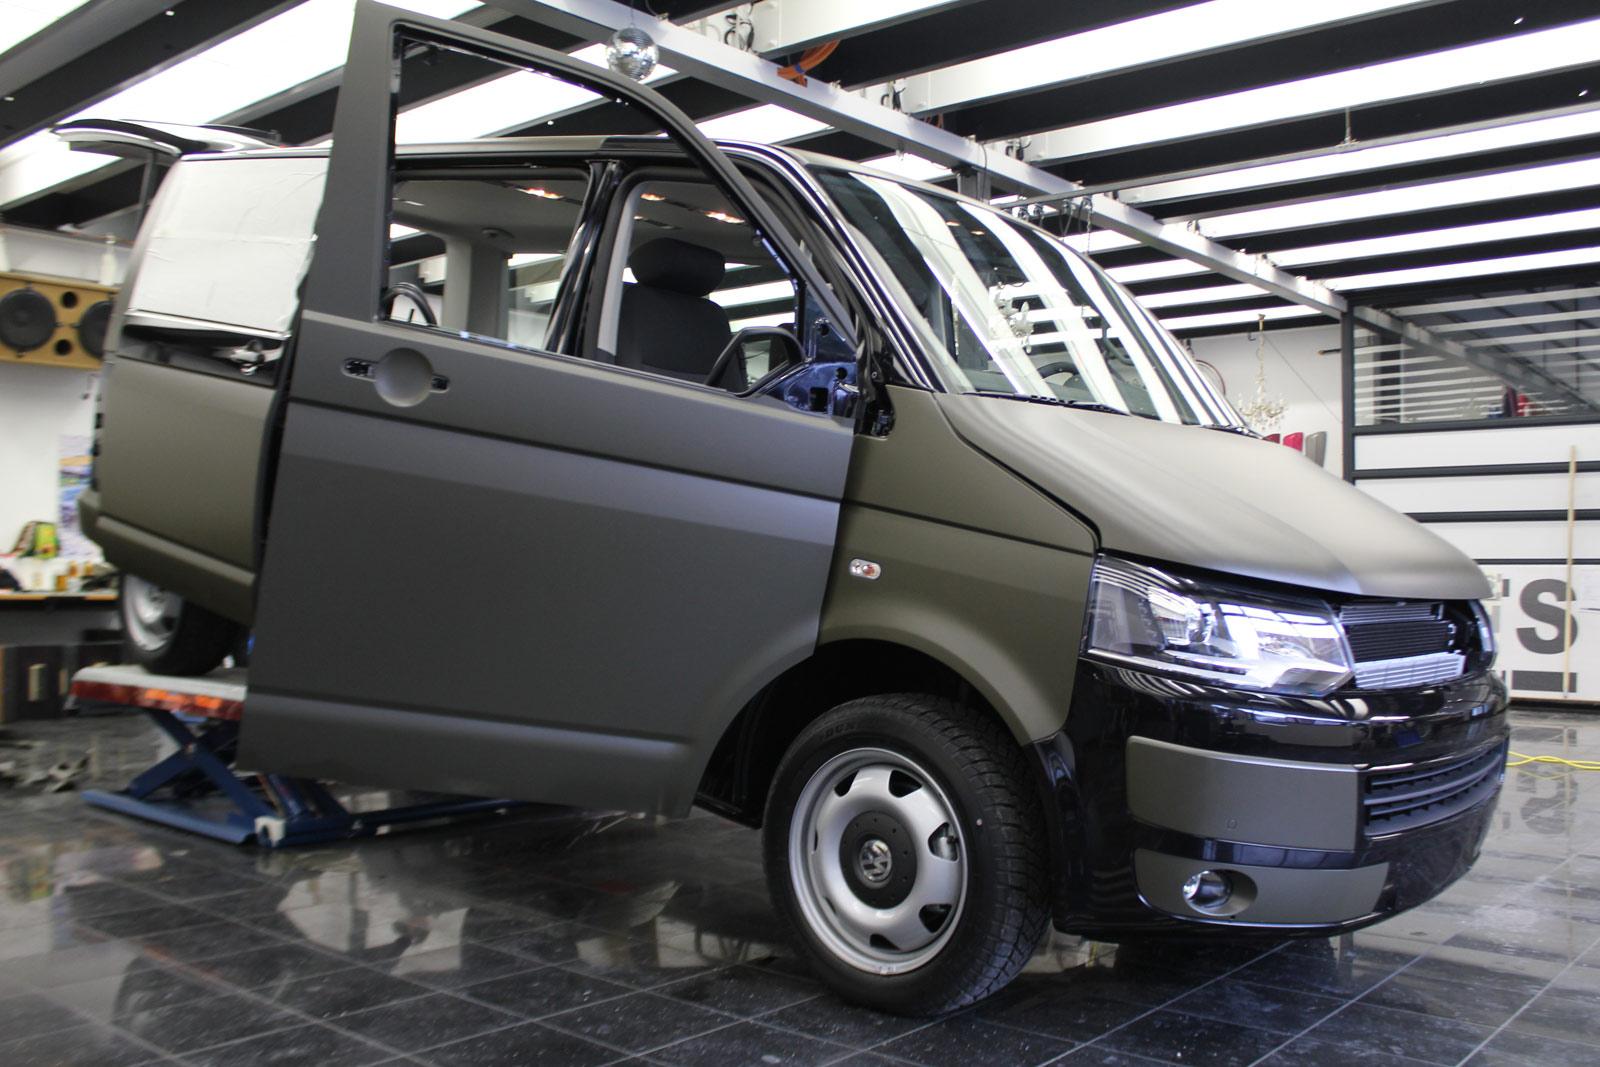 VW_T5_VOLLFOLIERUNG_NATO-OLIV_01